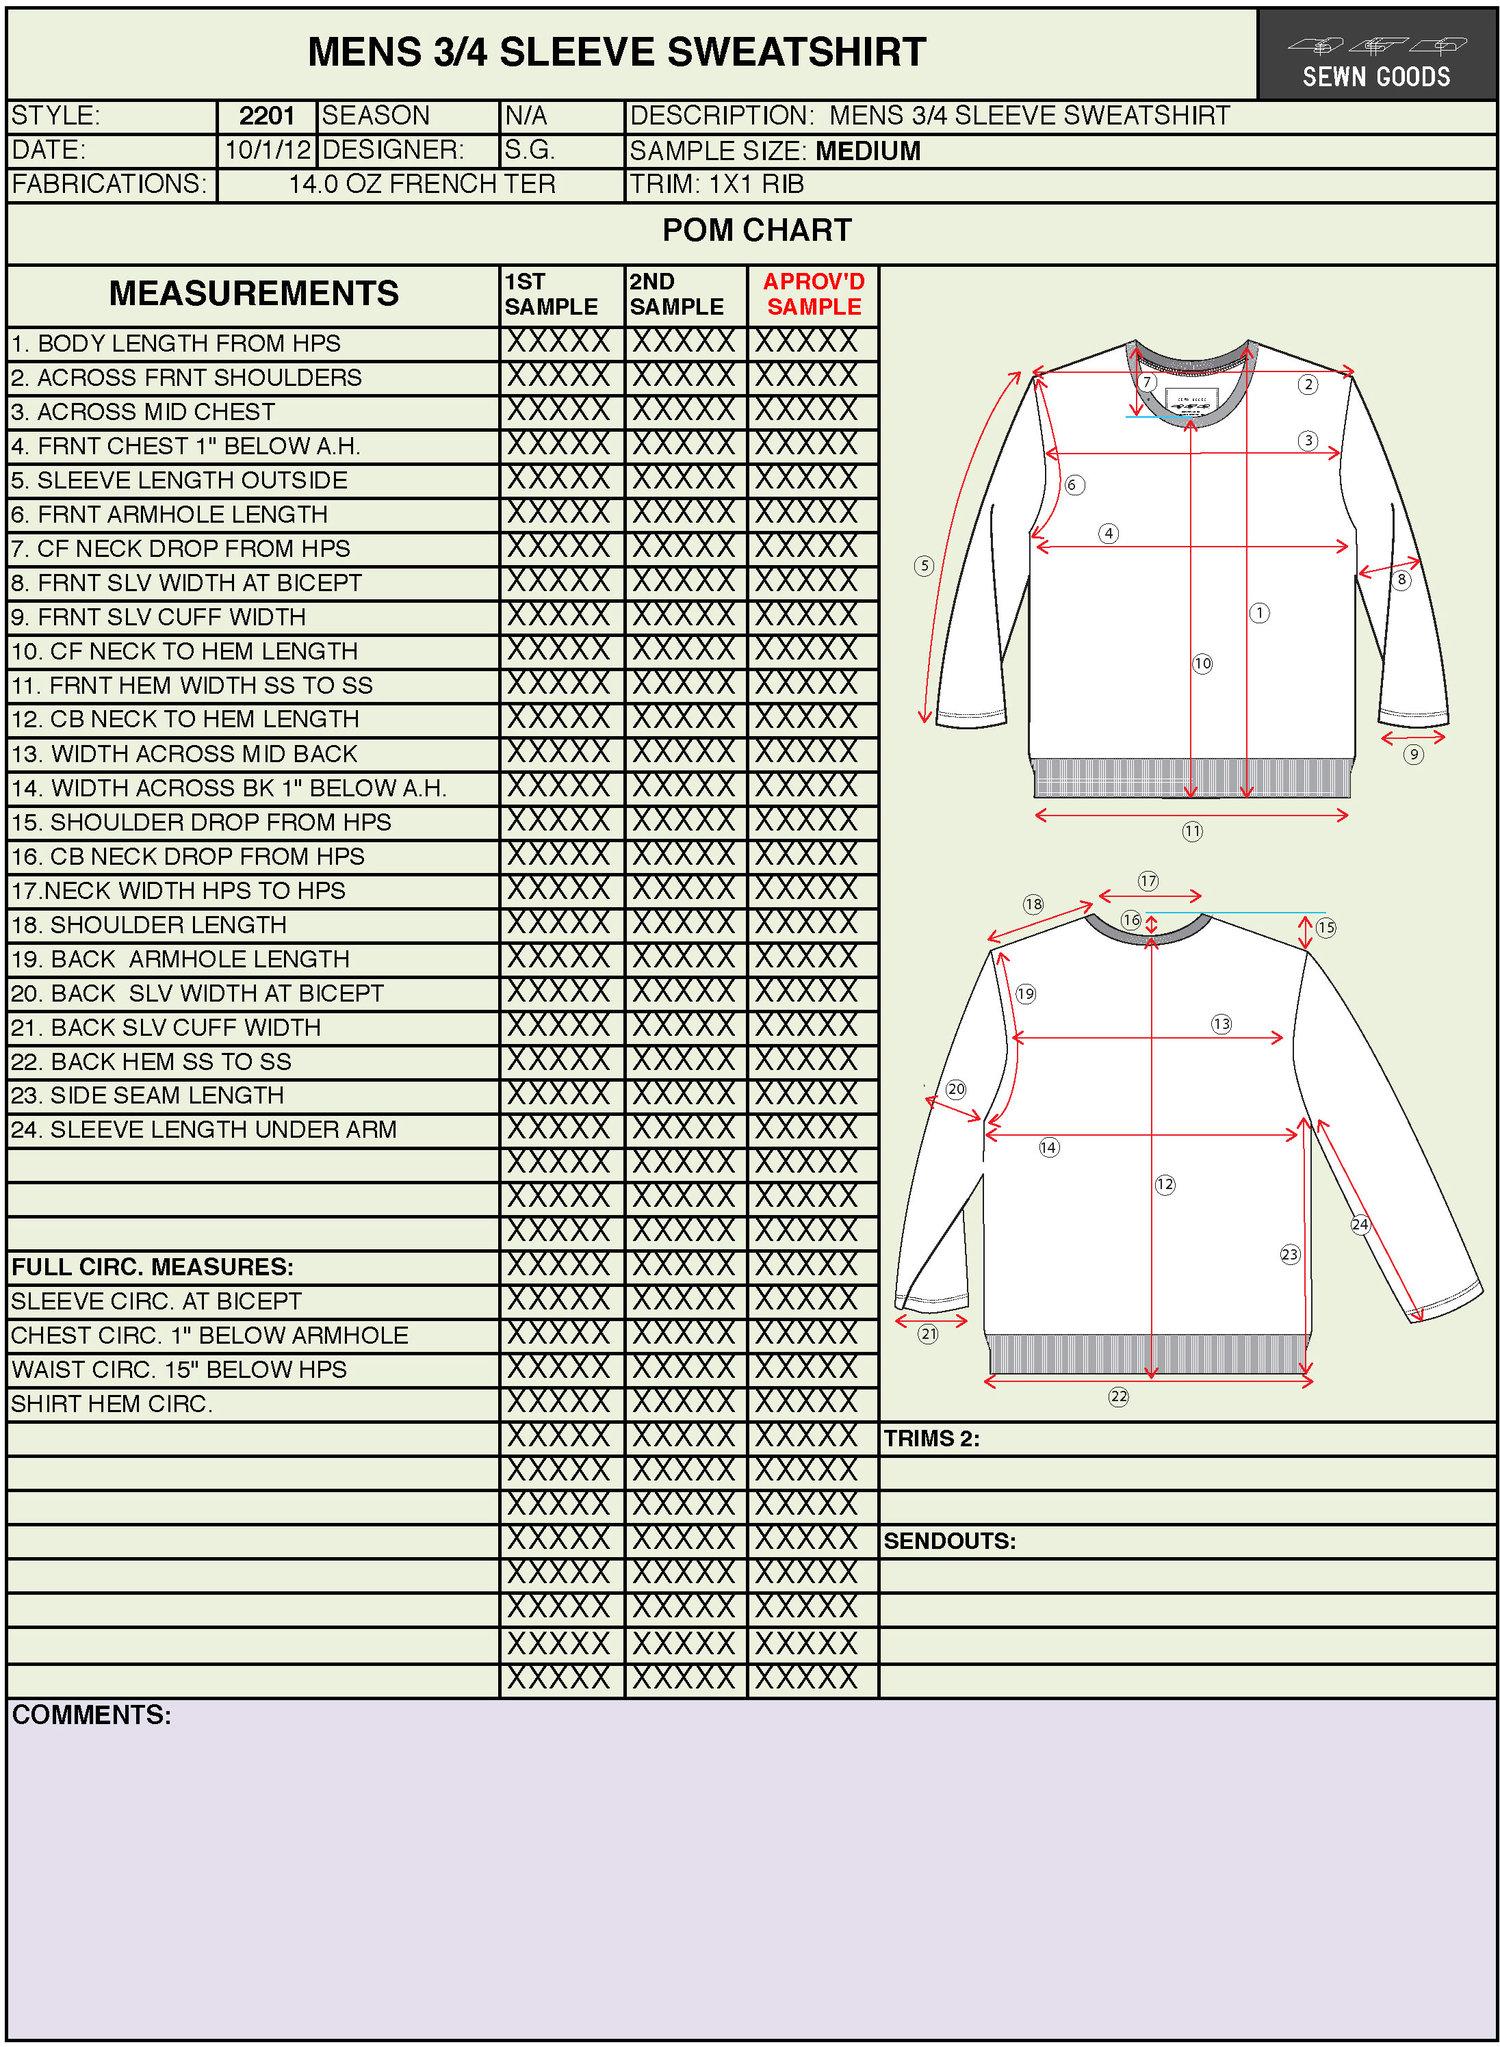 2206 Raglan Sleeve Sweatshirt Tech Pack Template Xs 4xl Sewn Goods Pattern Makers Sample Makers Apparel Design And Development